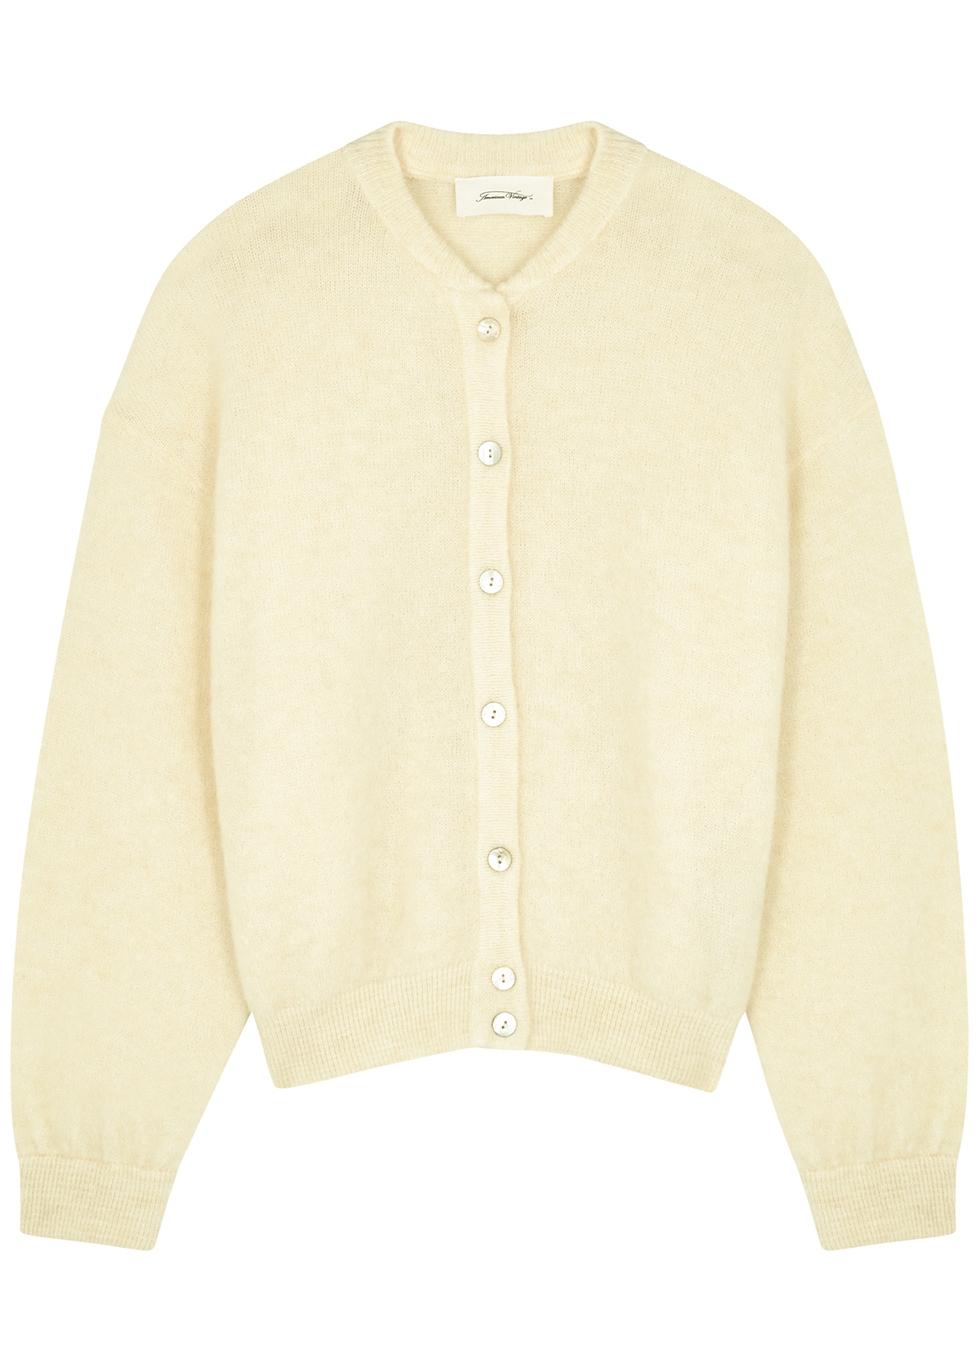 Zabidoo cream knitted cardigan